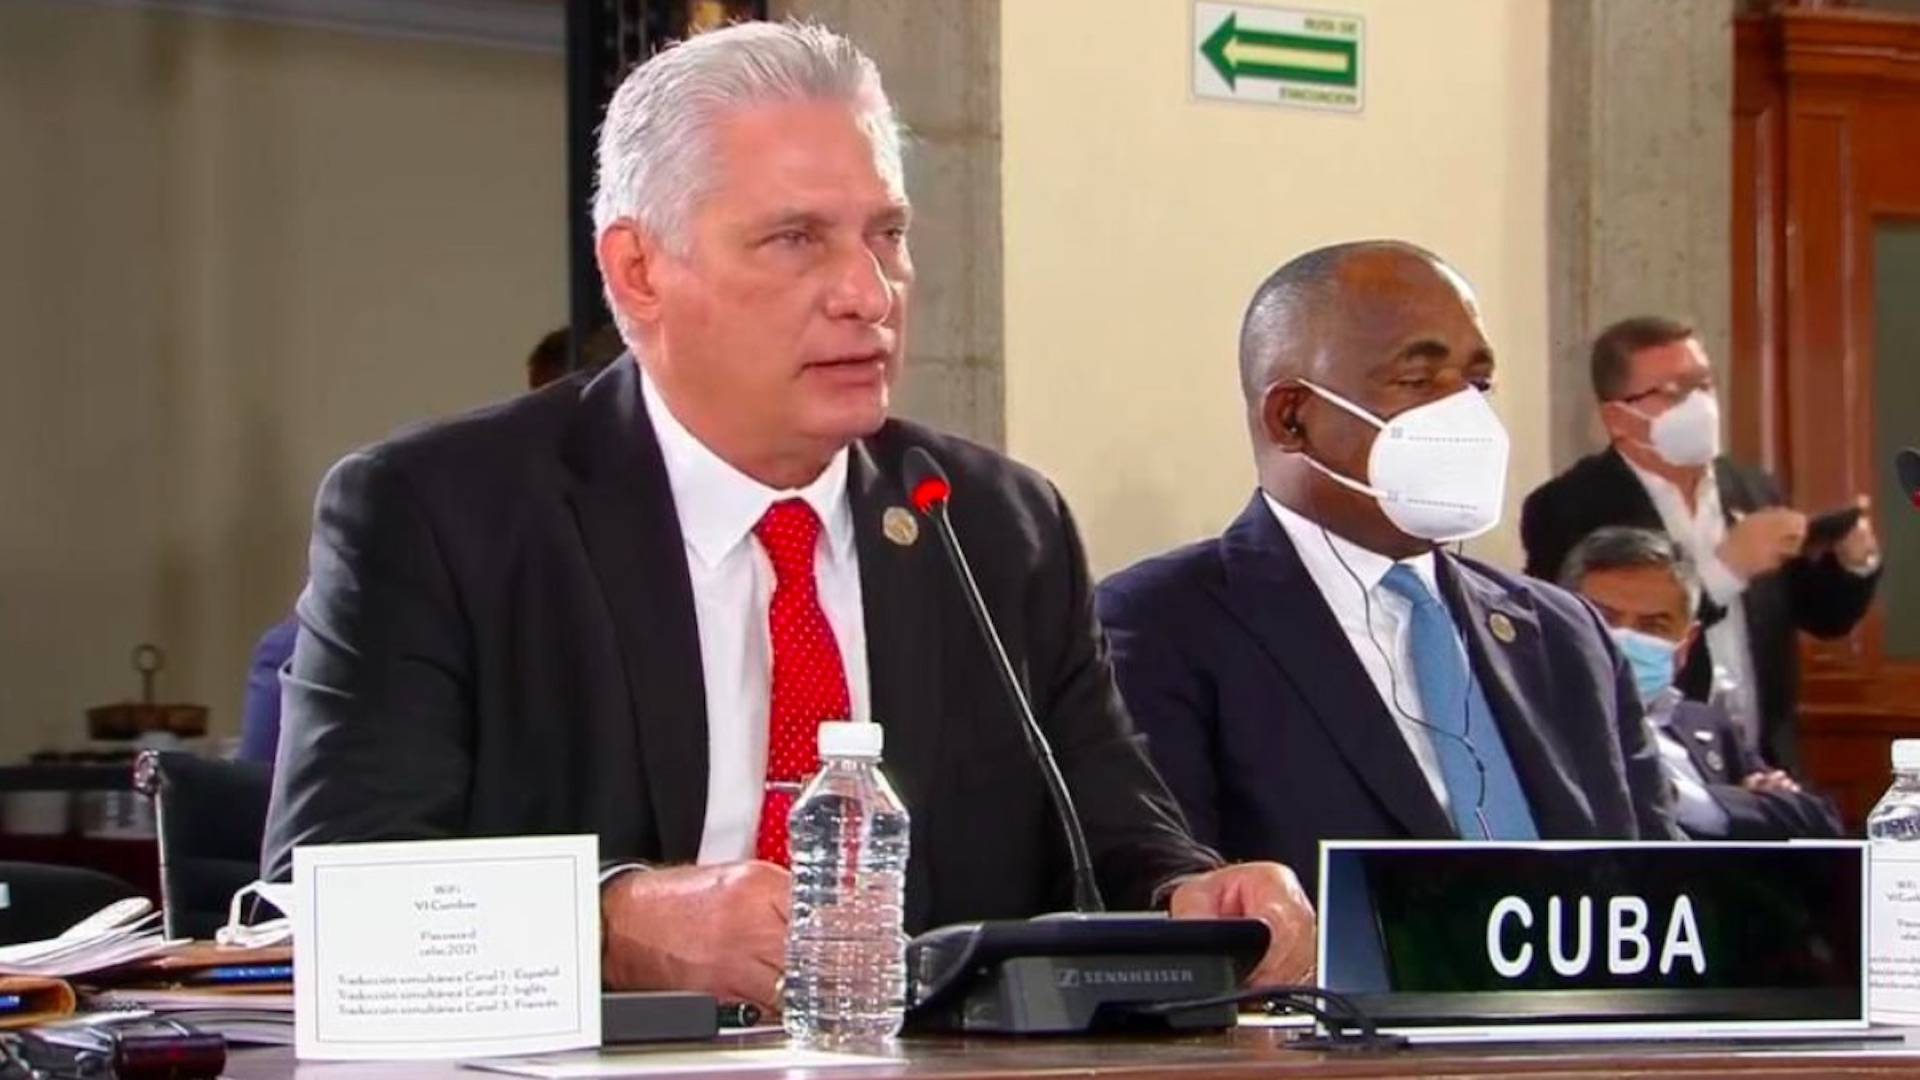 Discurso de Miguel Díaz-Canel Bermúdez en la VI Cumbre de la CELAC, en México